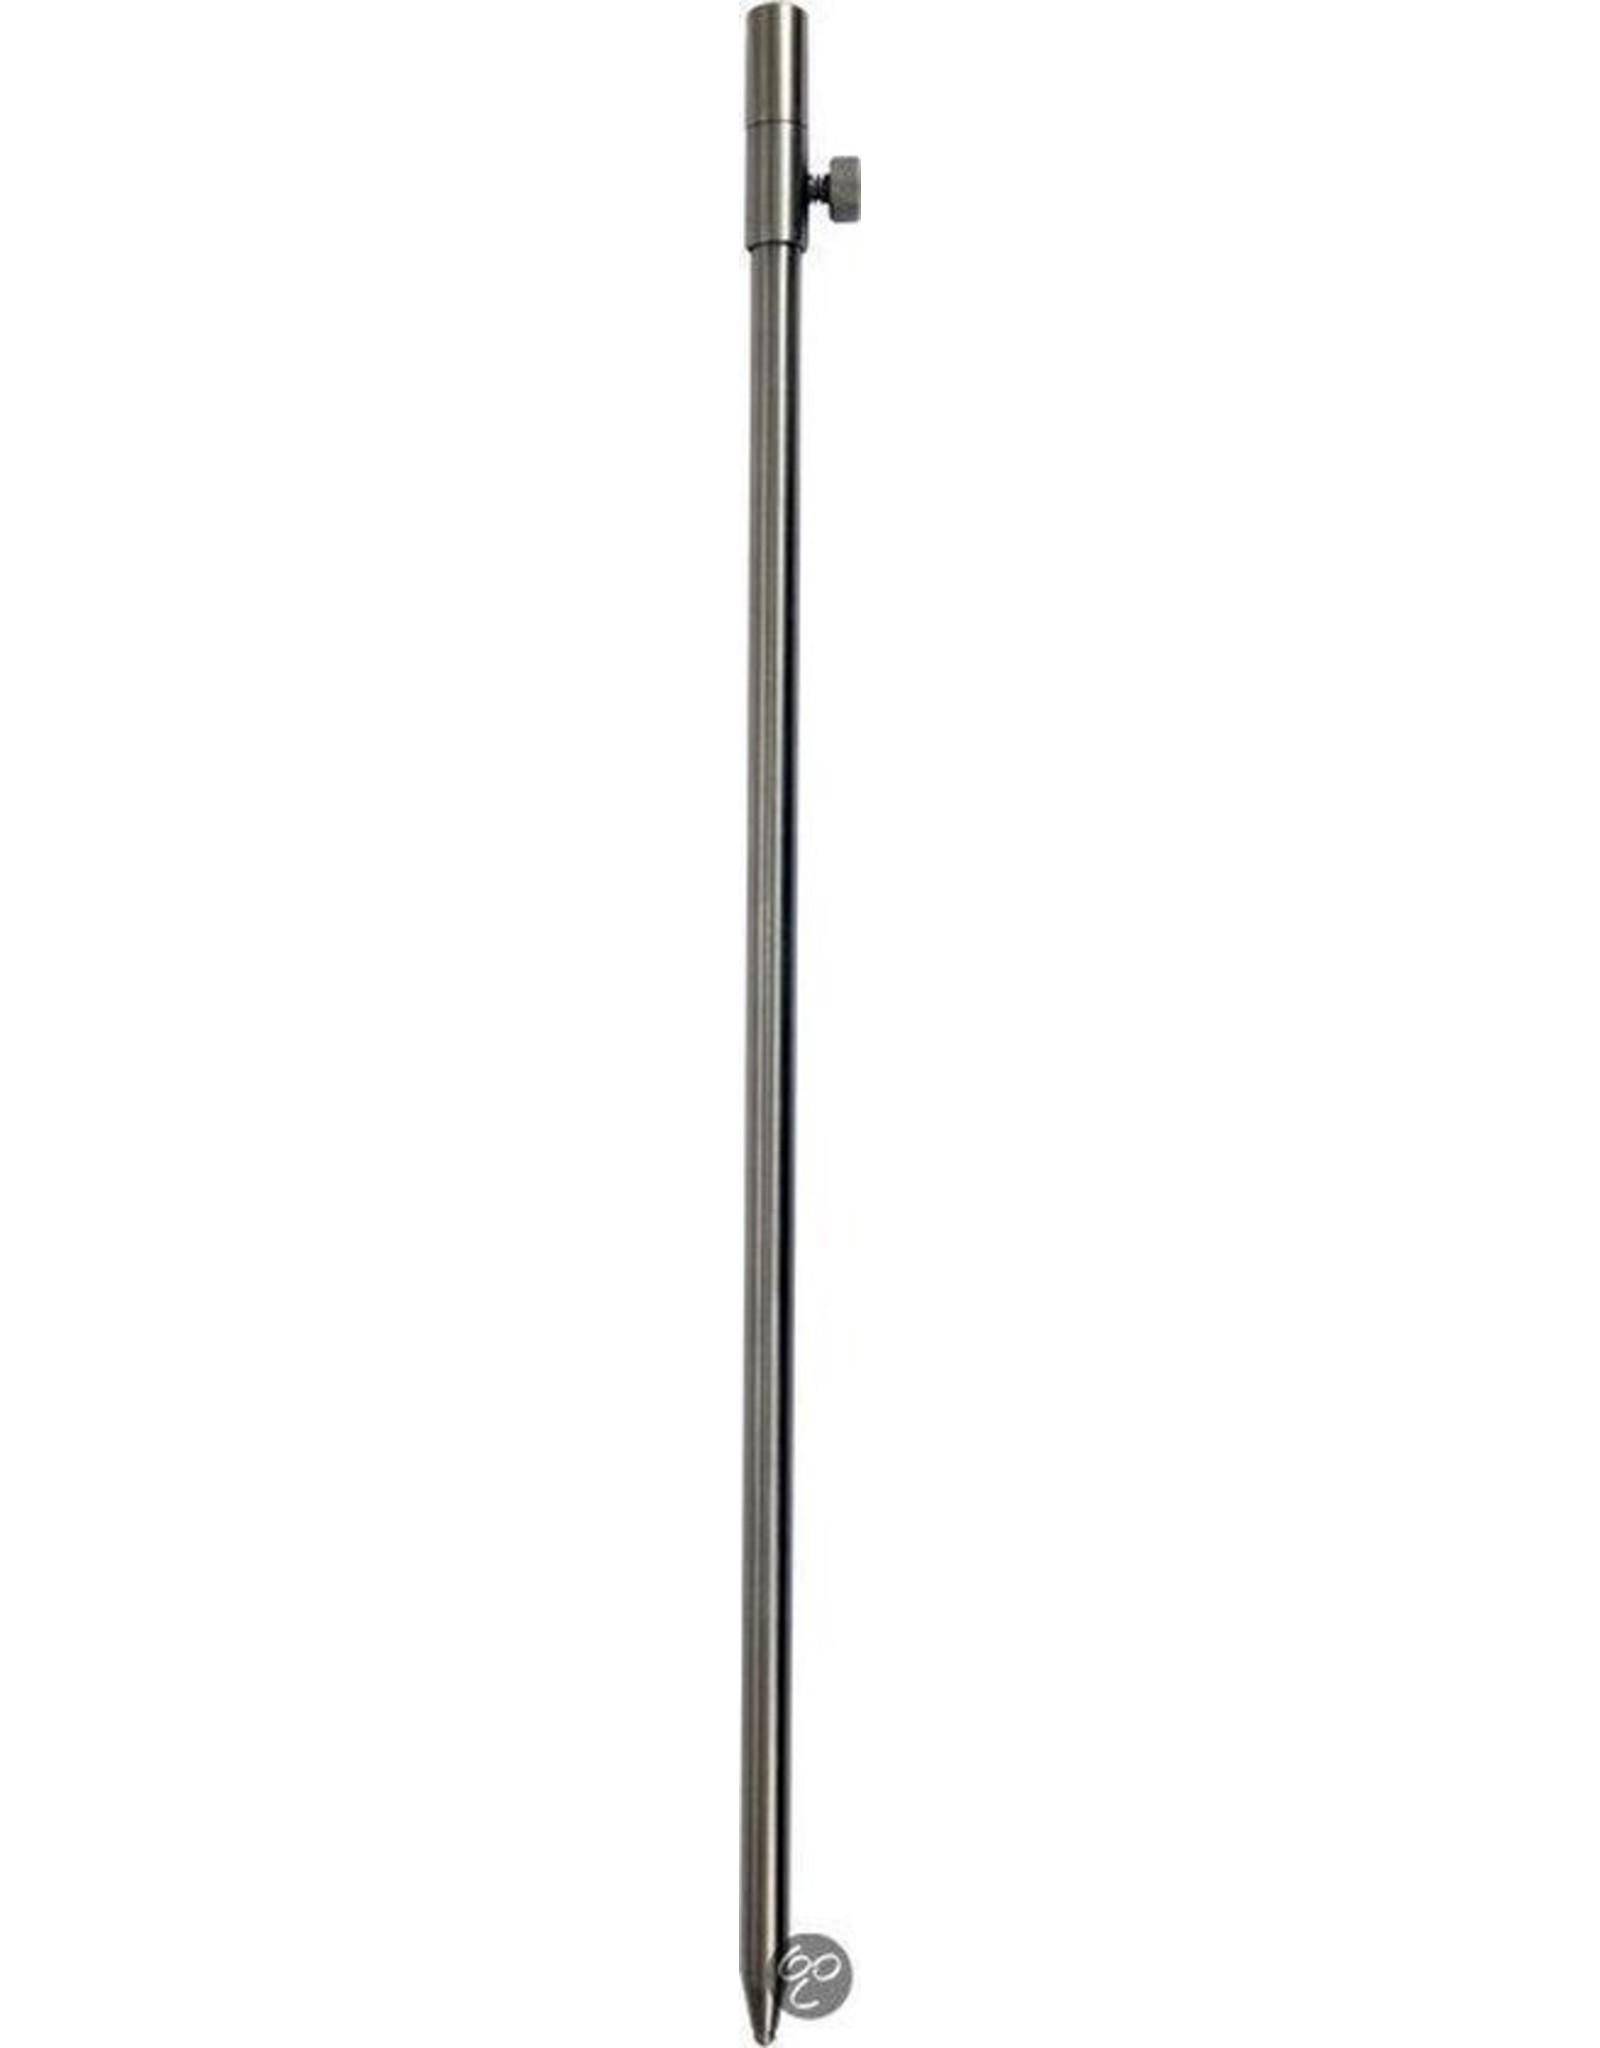 Albatros Soul Stainless bankstick 50-86 cm